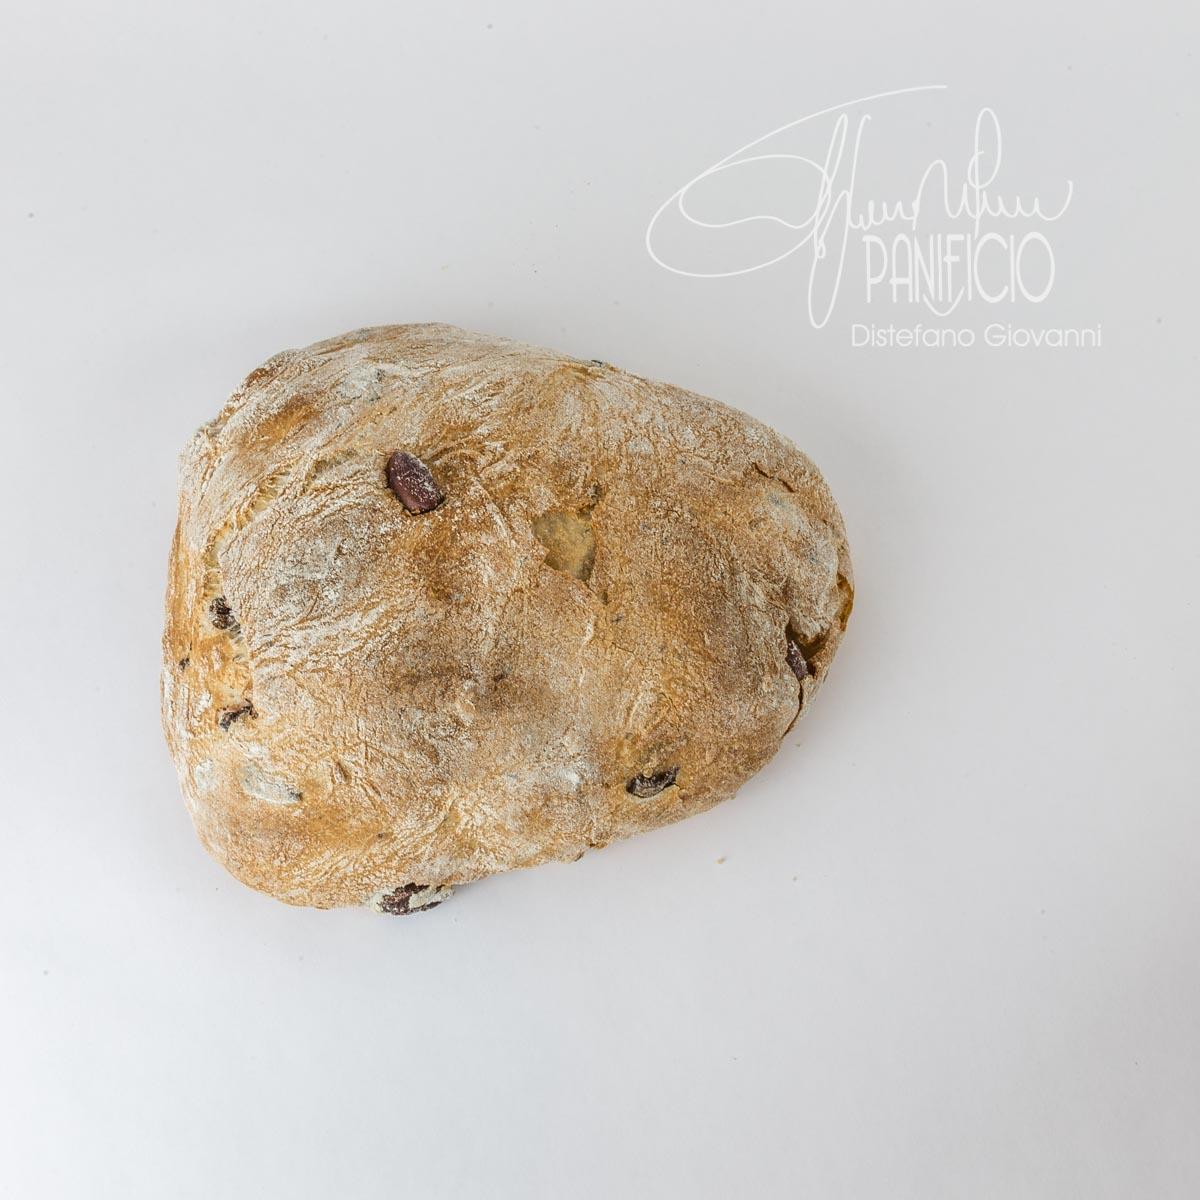 pane con olive nere